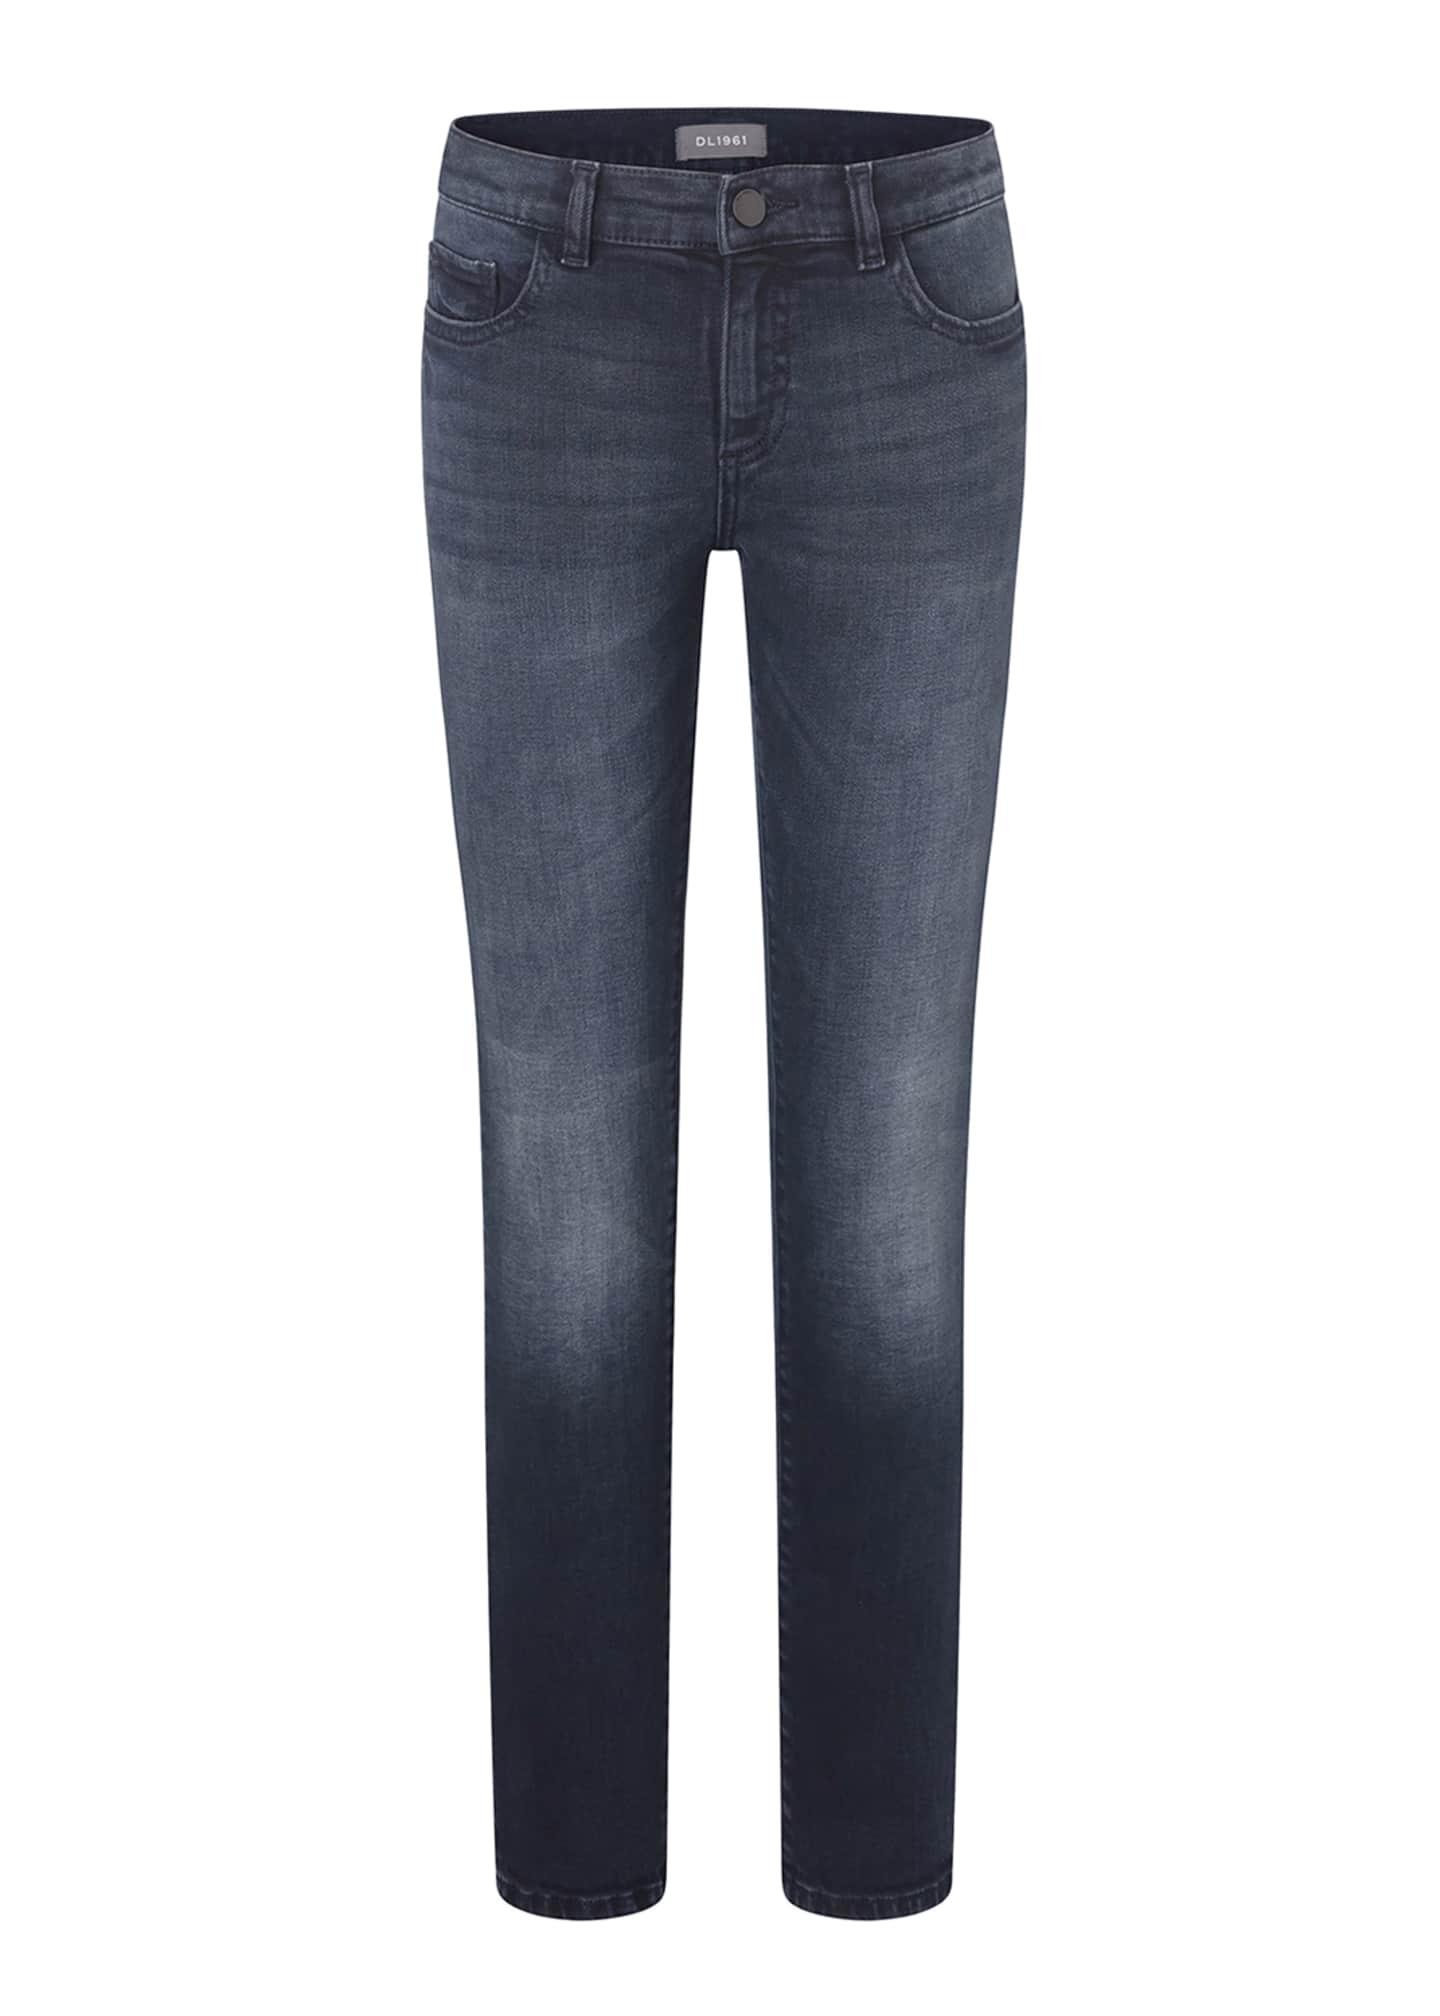 DL 1961 Boys' Zayne Super Skinny Jeans, Toddler